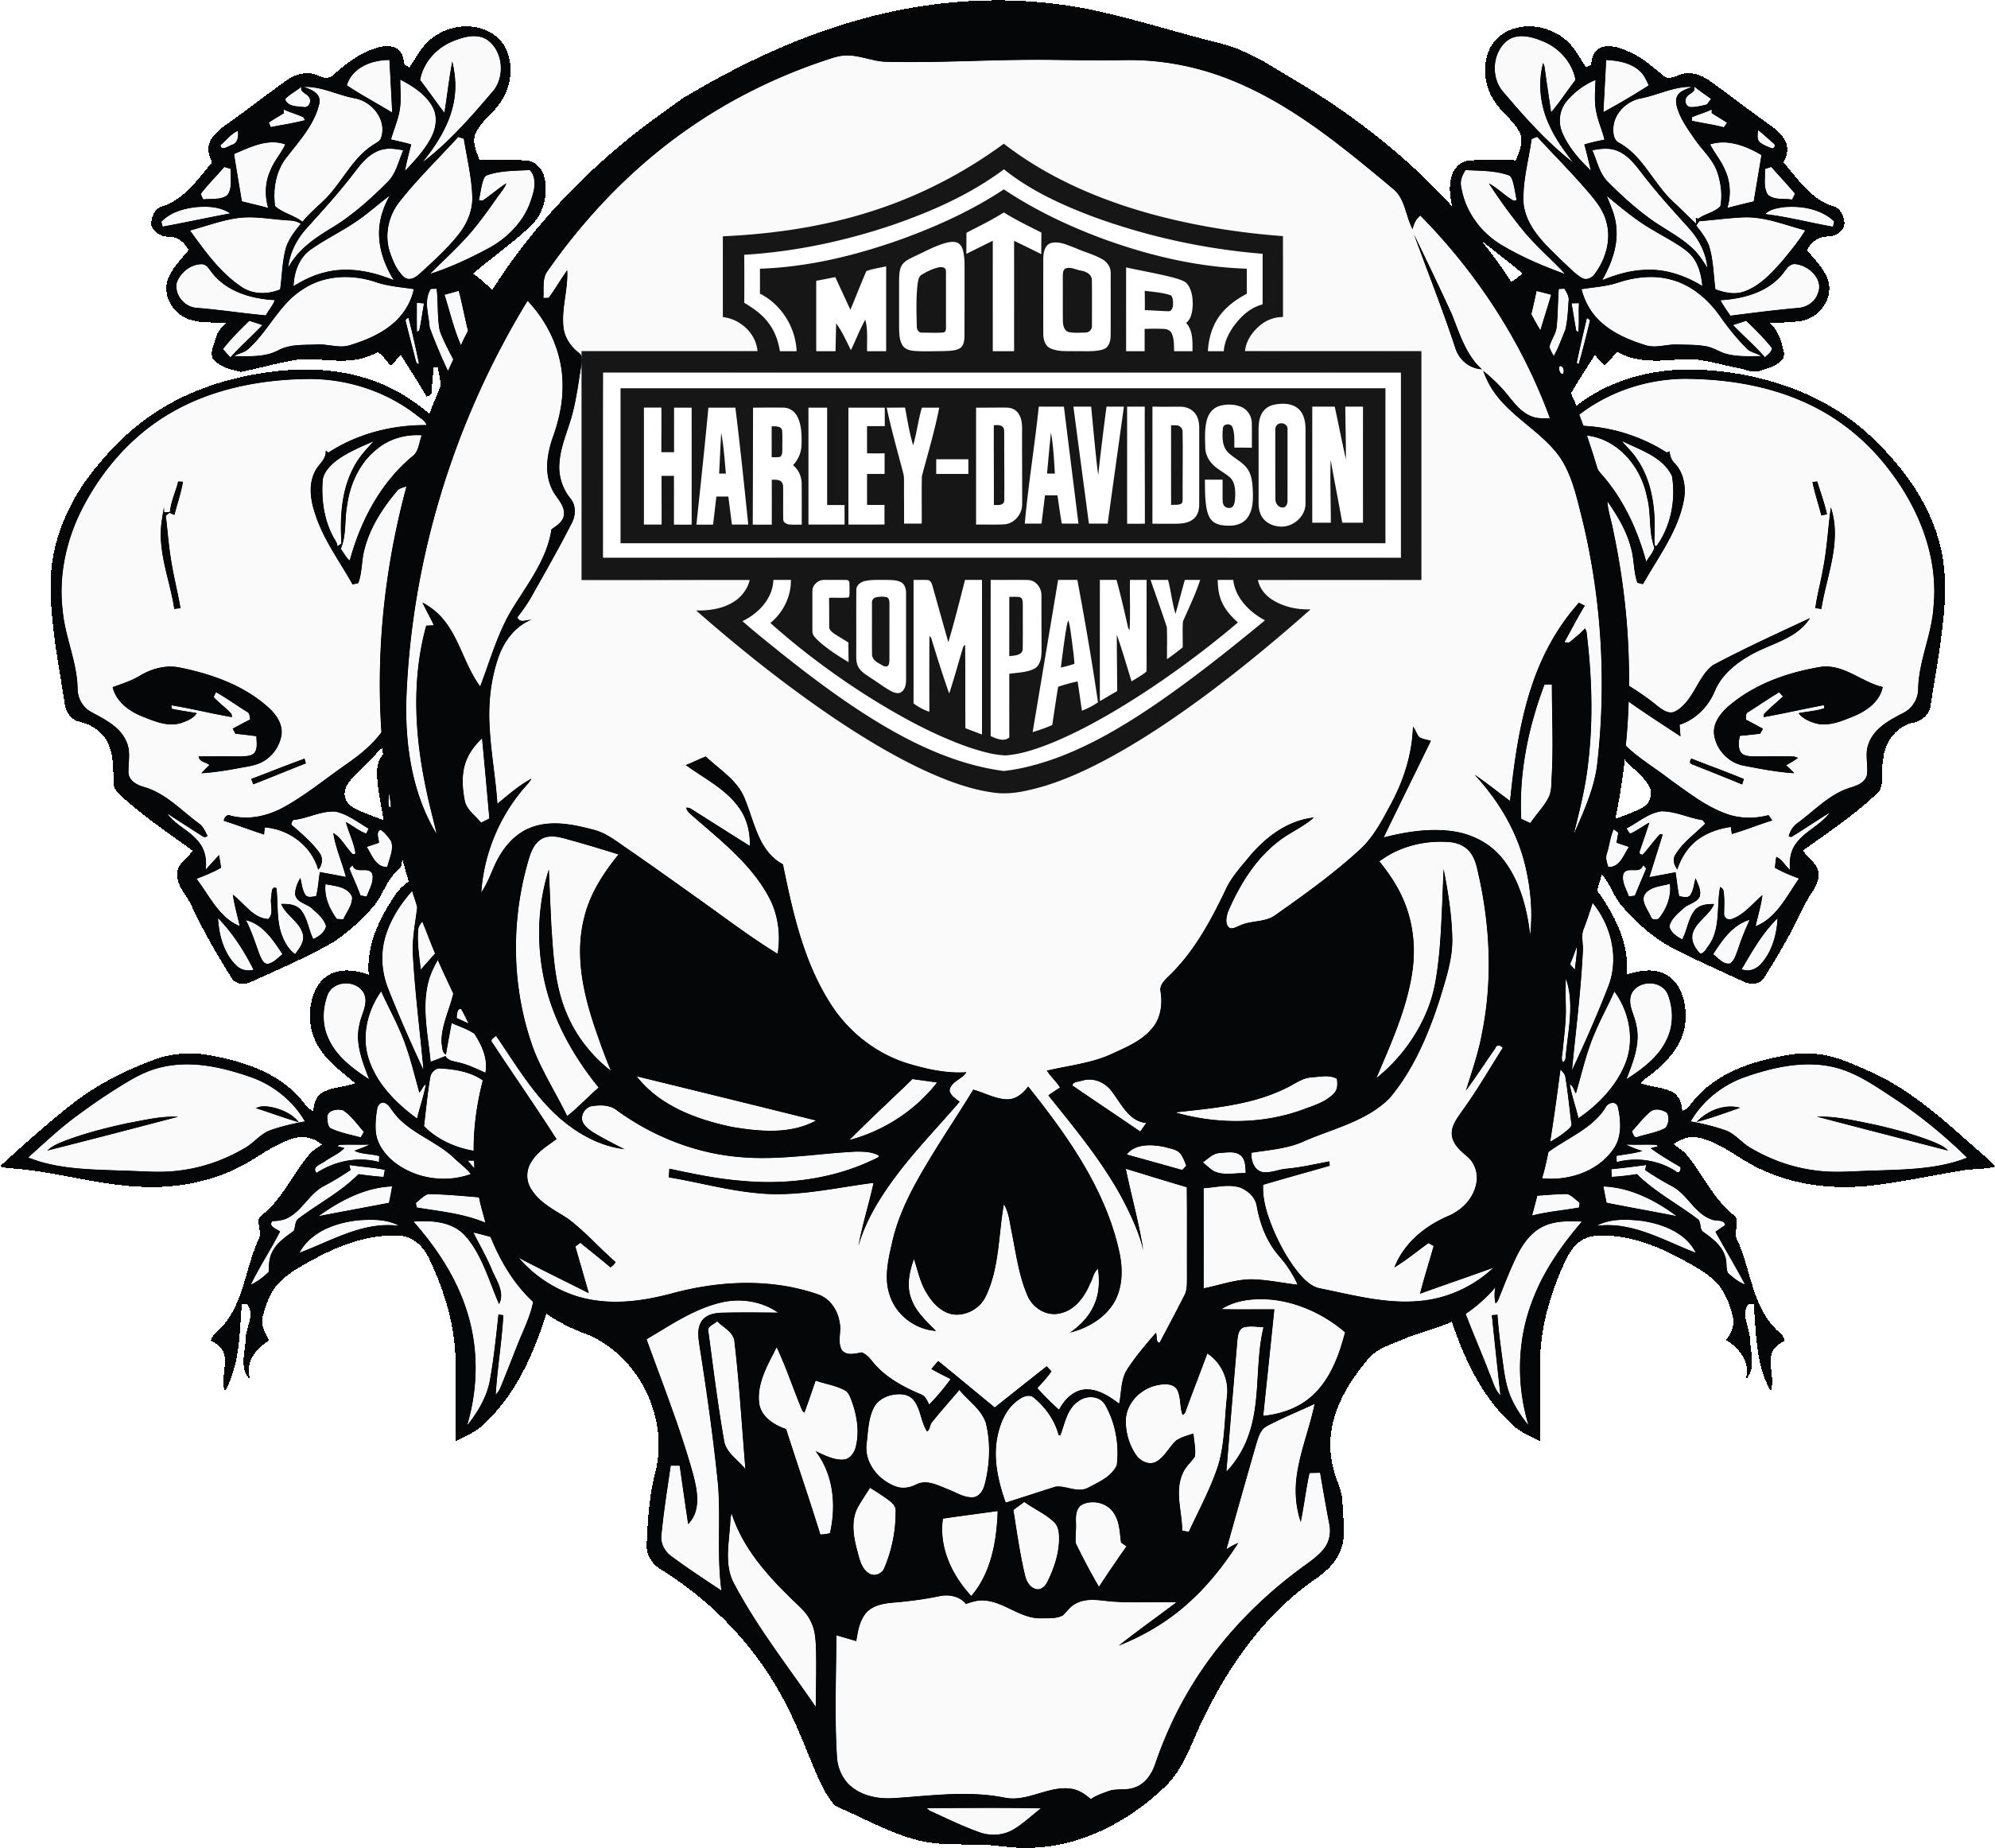 Resultat Dimages Pour Harley Davidson Stencil Patterns Free Printable Vinyl